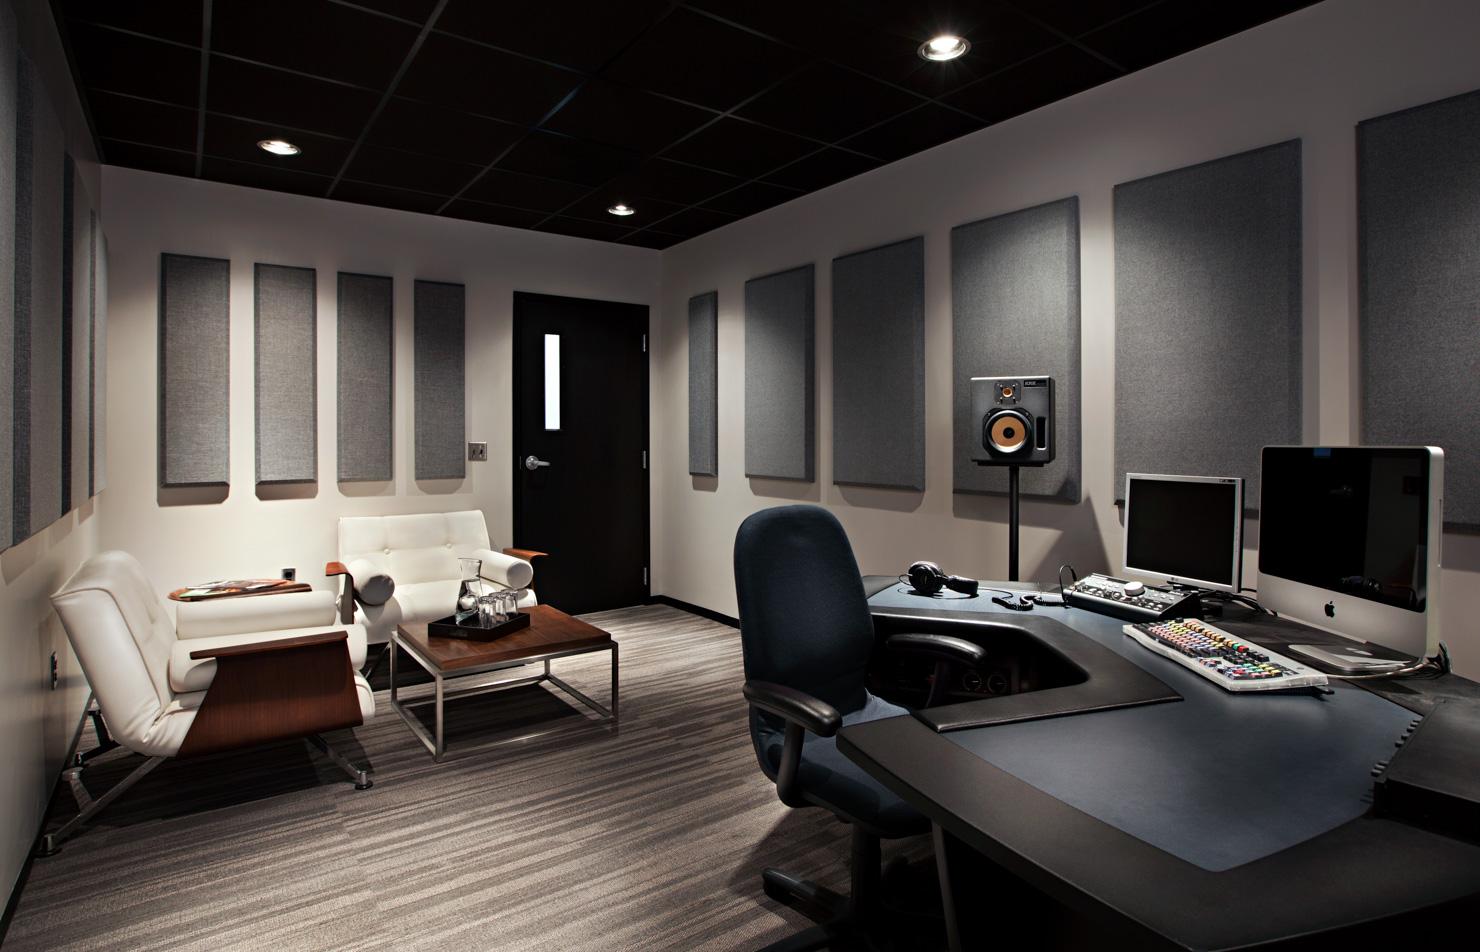 editing room studio architecture photographer klein digital dana